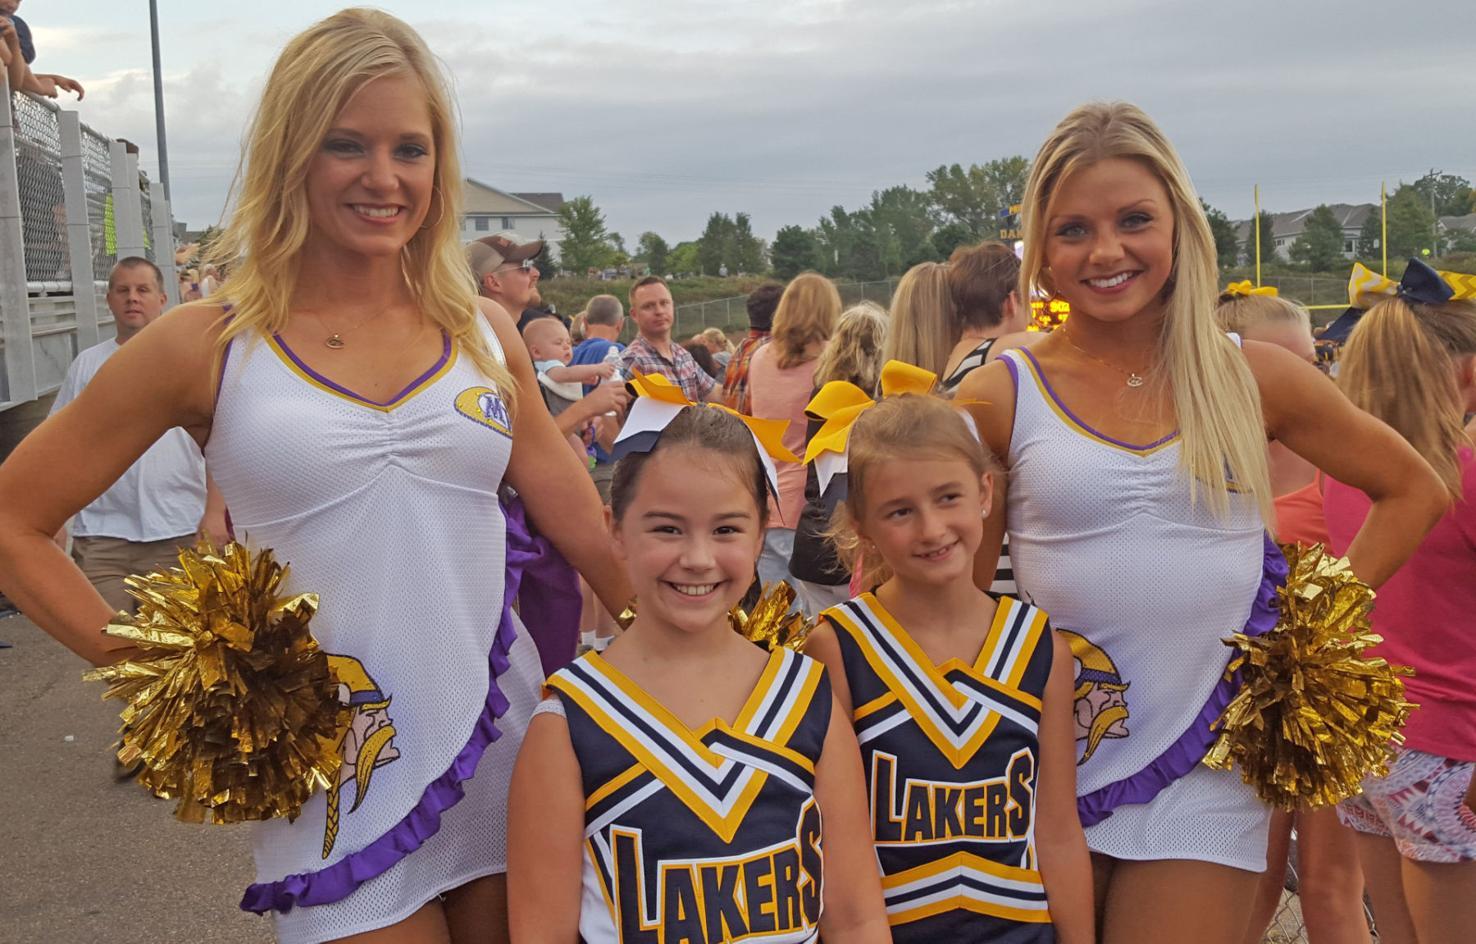 Young fans meet Vikings cheerleaders at Lakers game